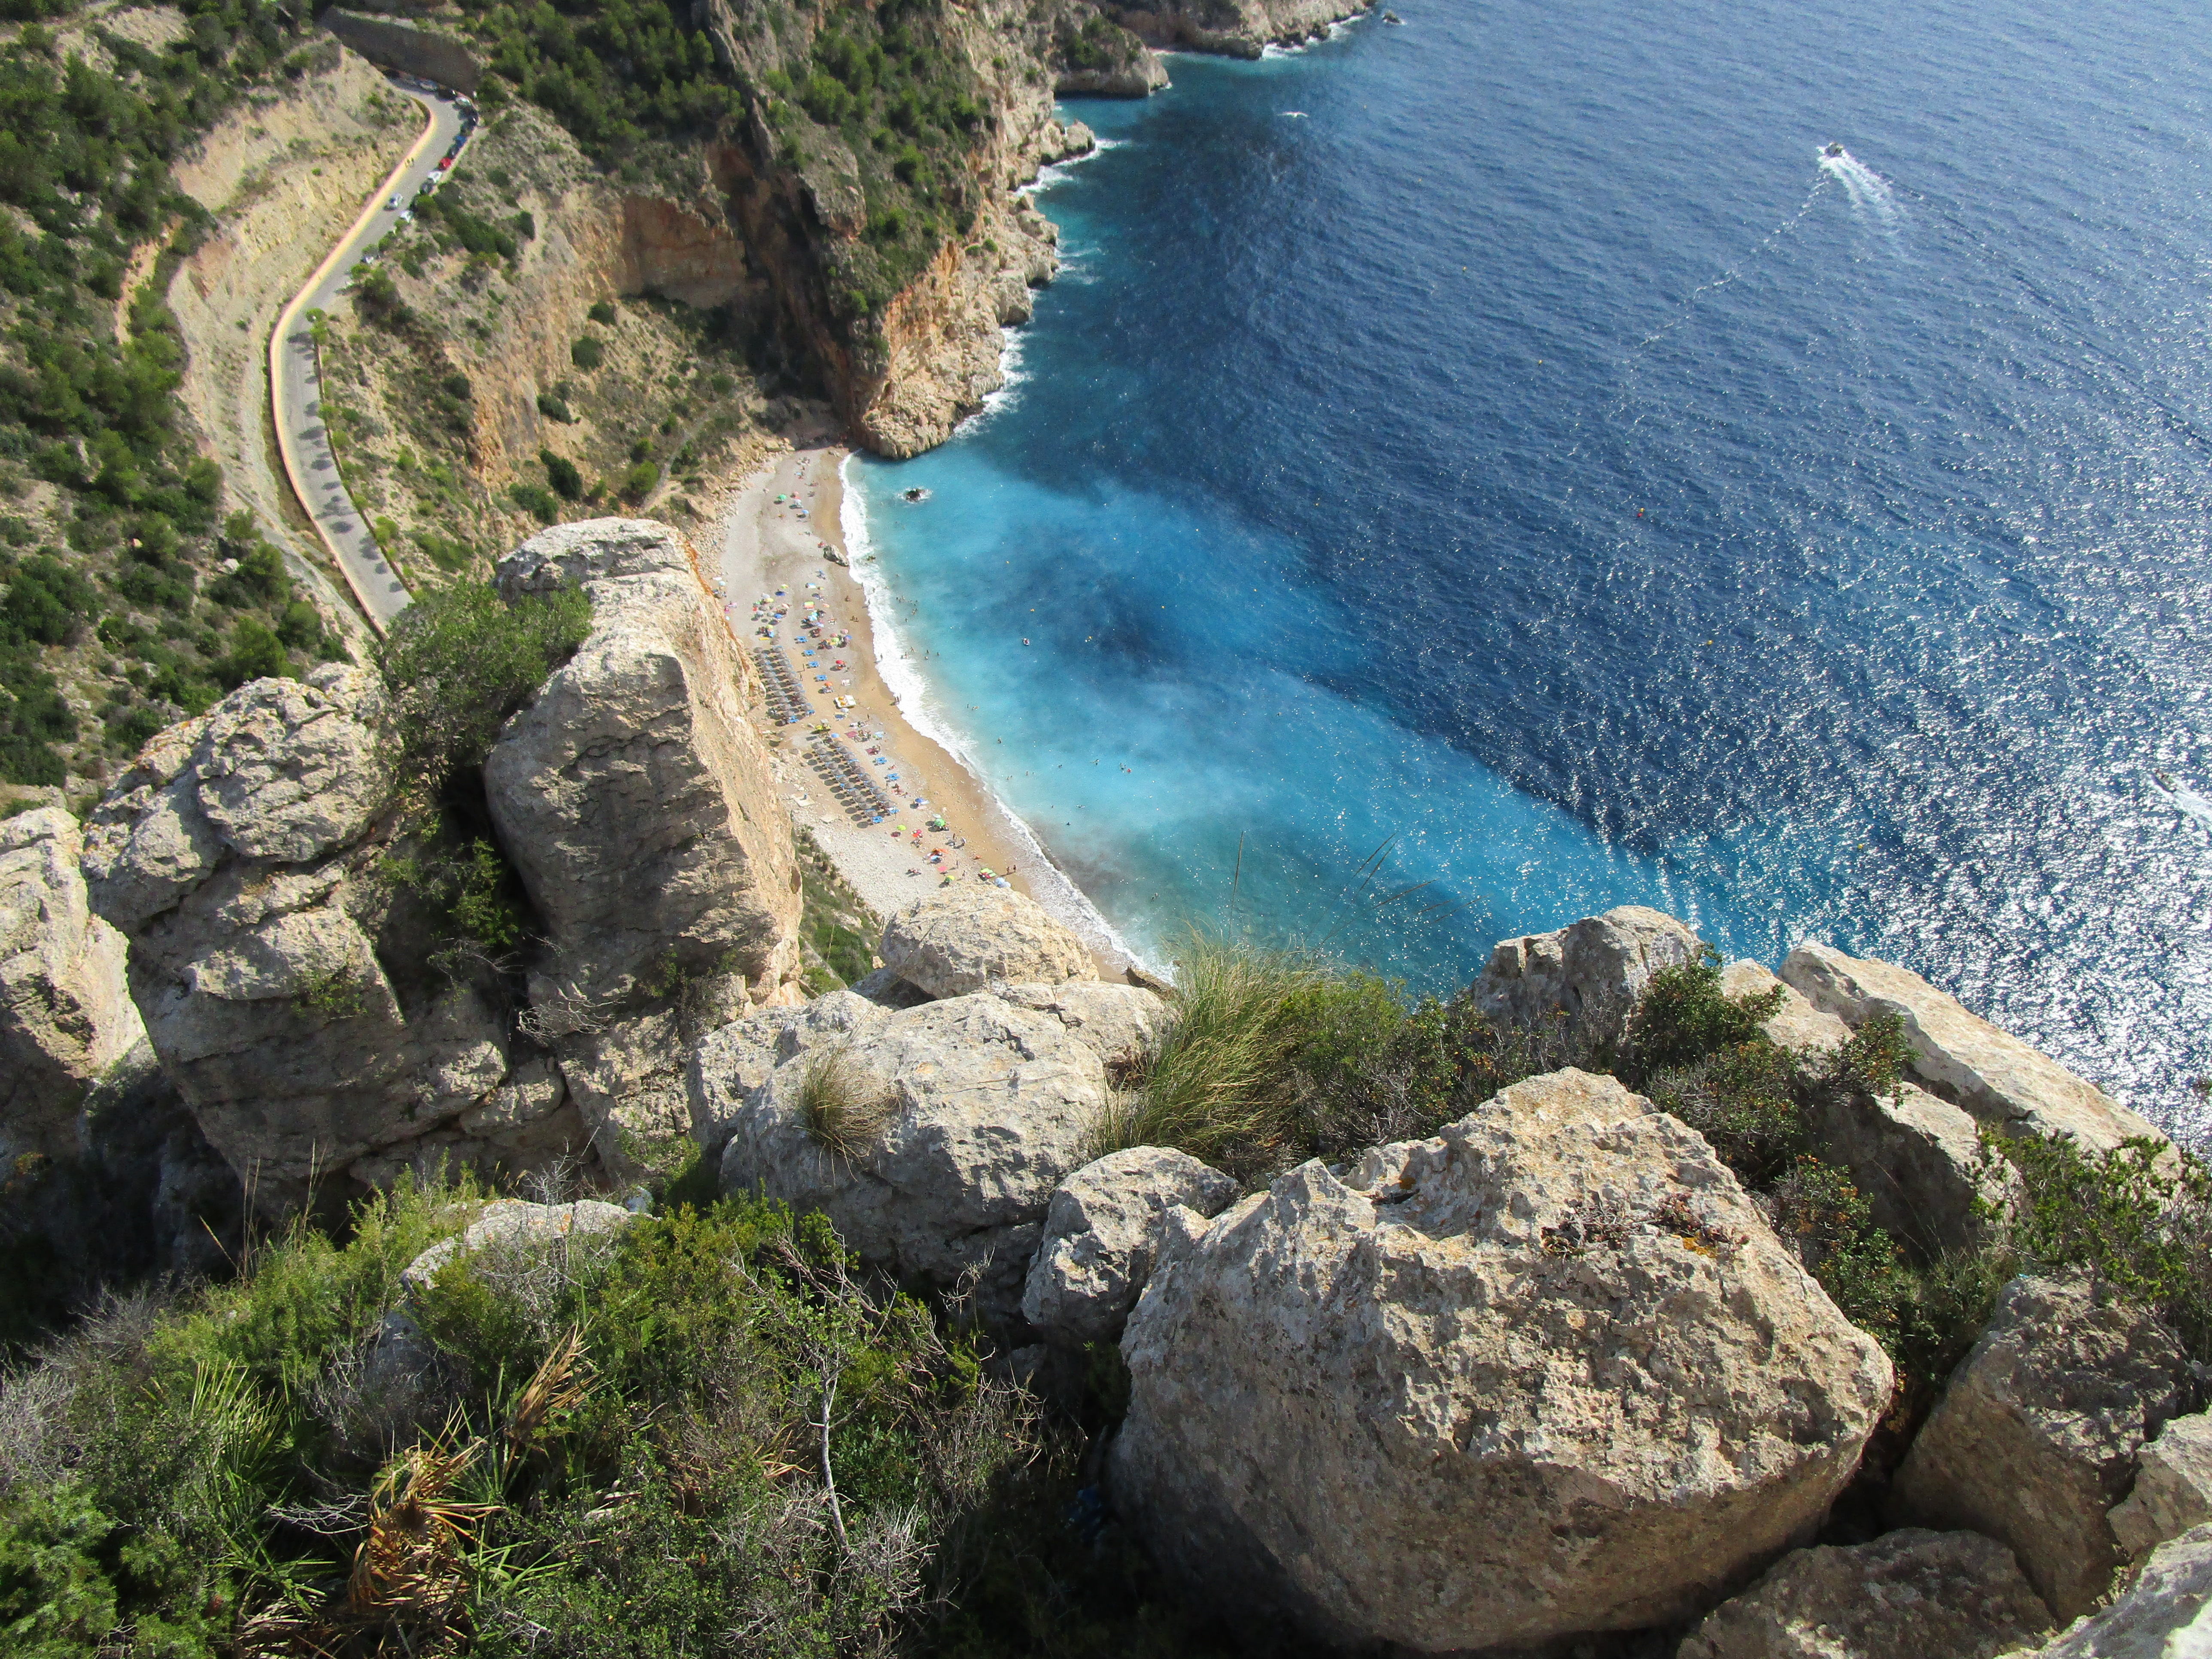 Calla Moraig – La plage de la Cumbre